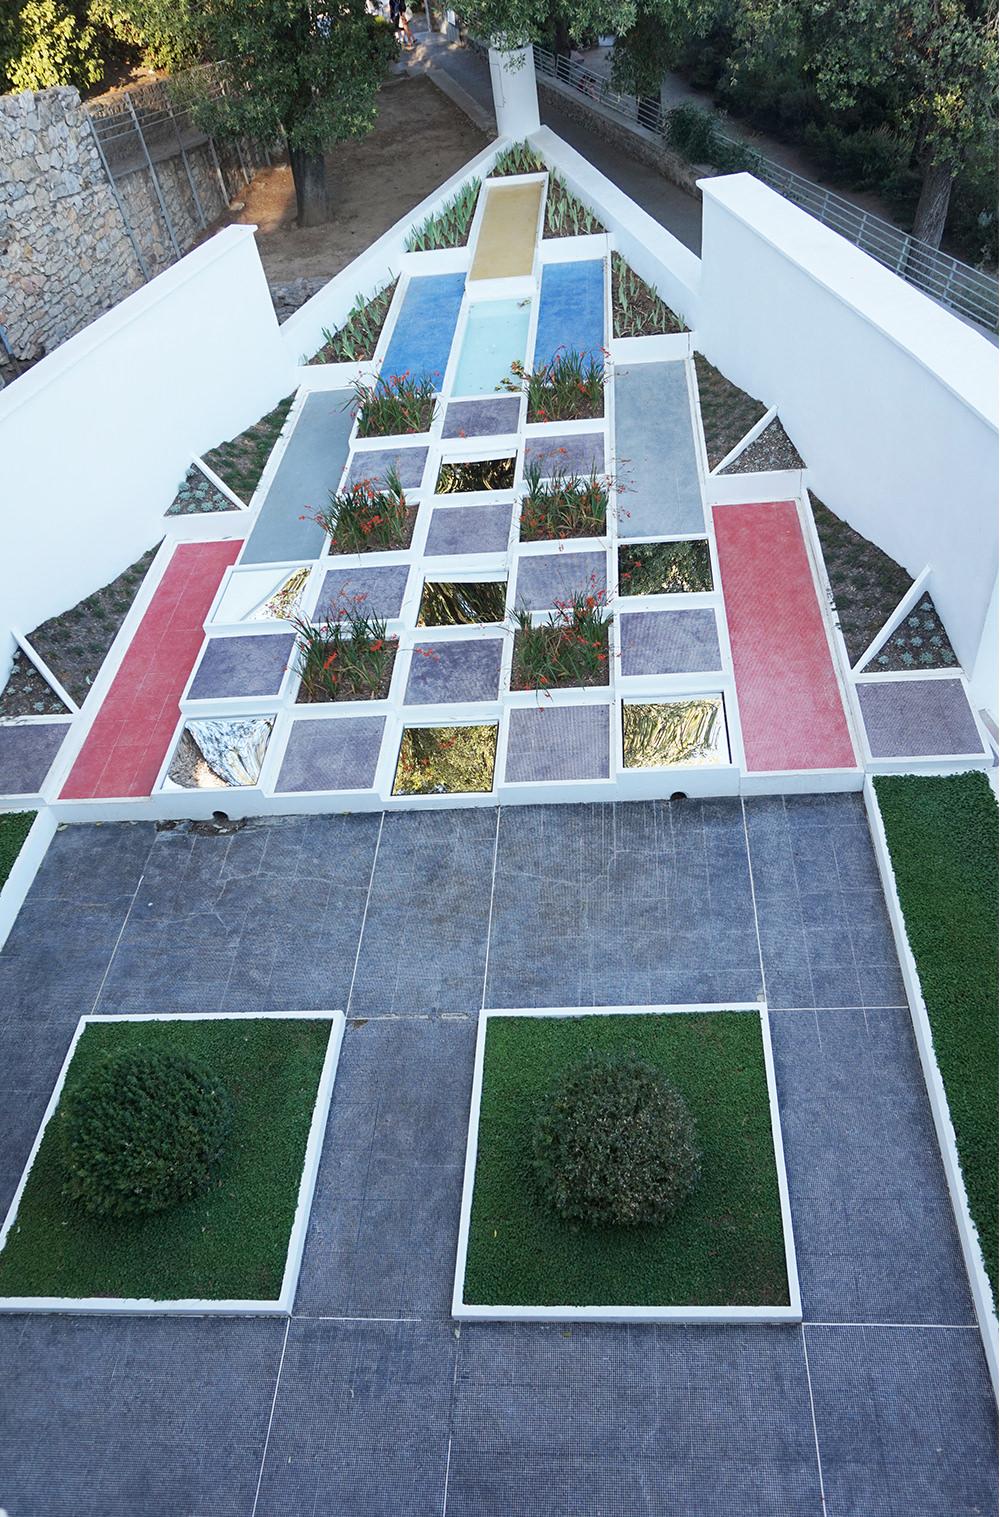 21 - Villa Noailles - Jardin